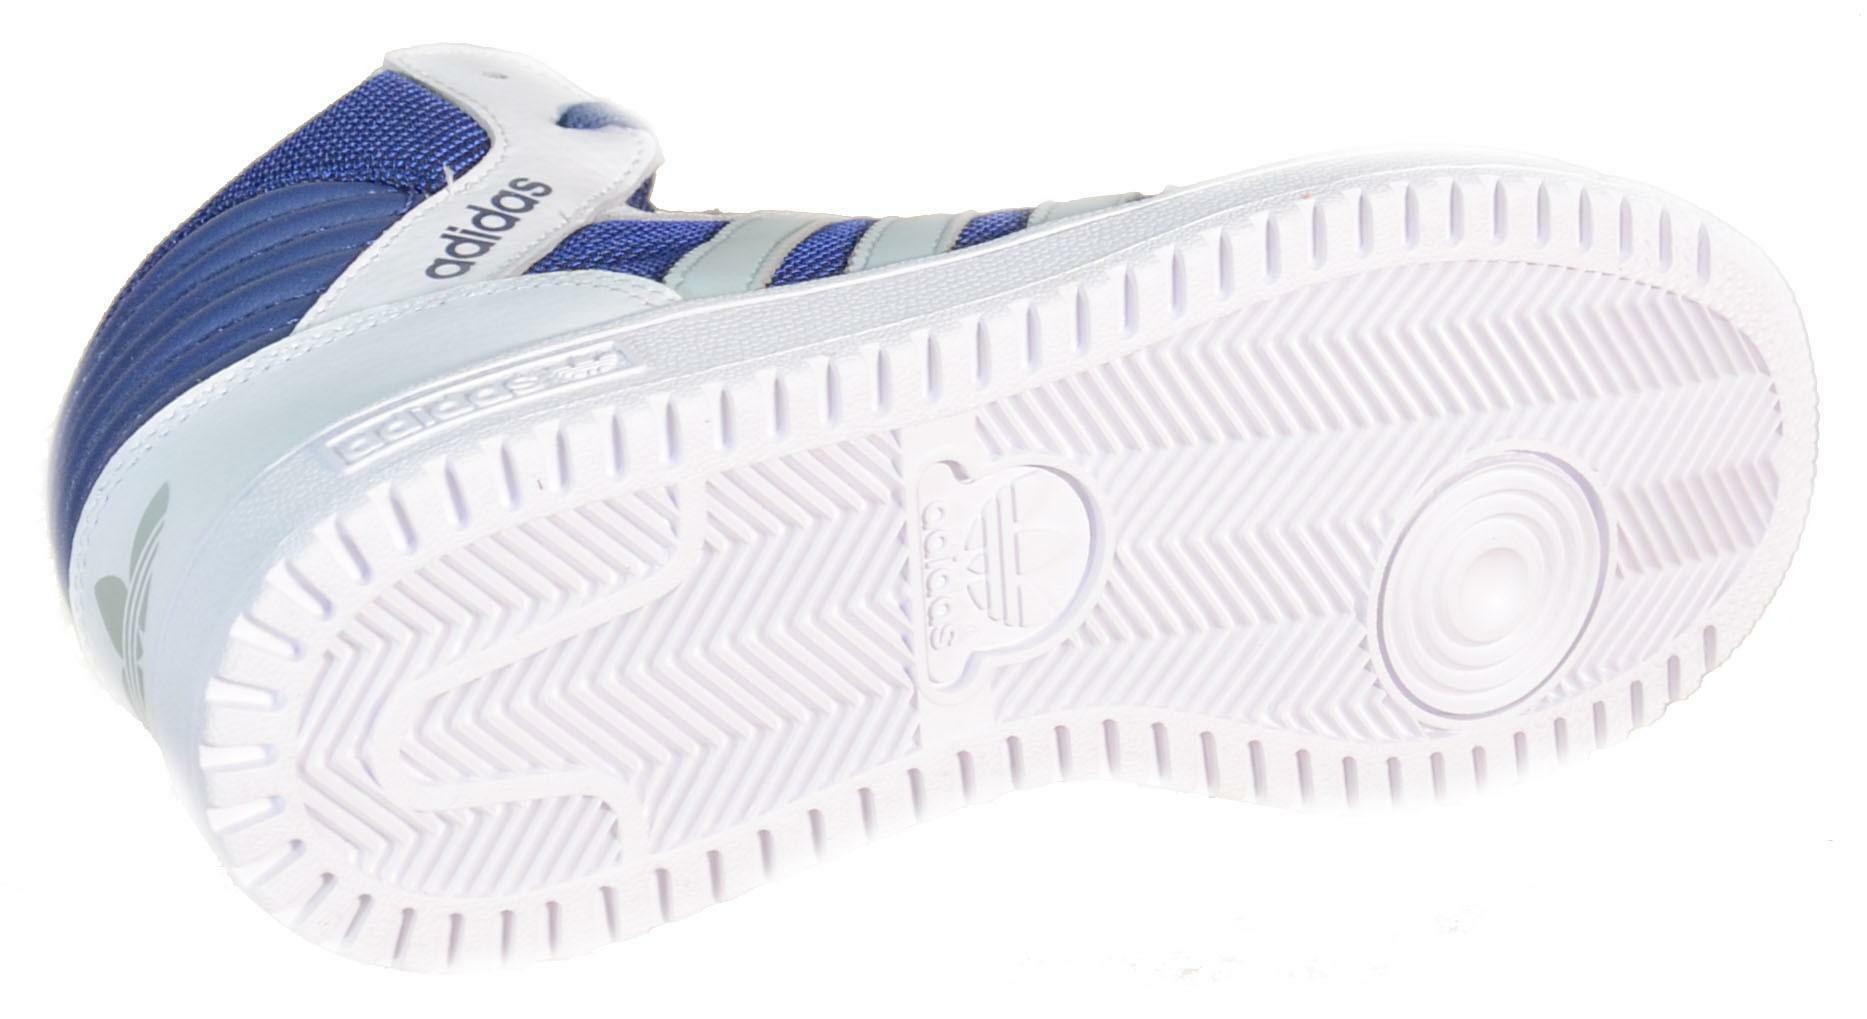 adidas adidas pro play k scarpe sportive bambino bianche blu pelle tela b25707